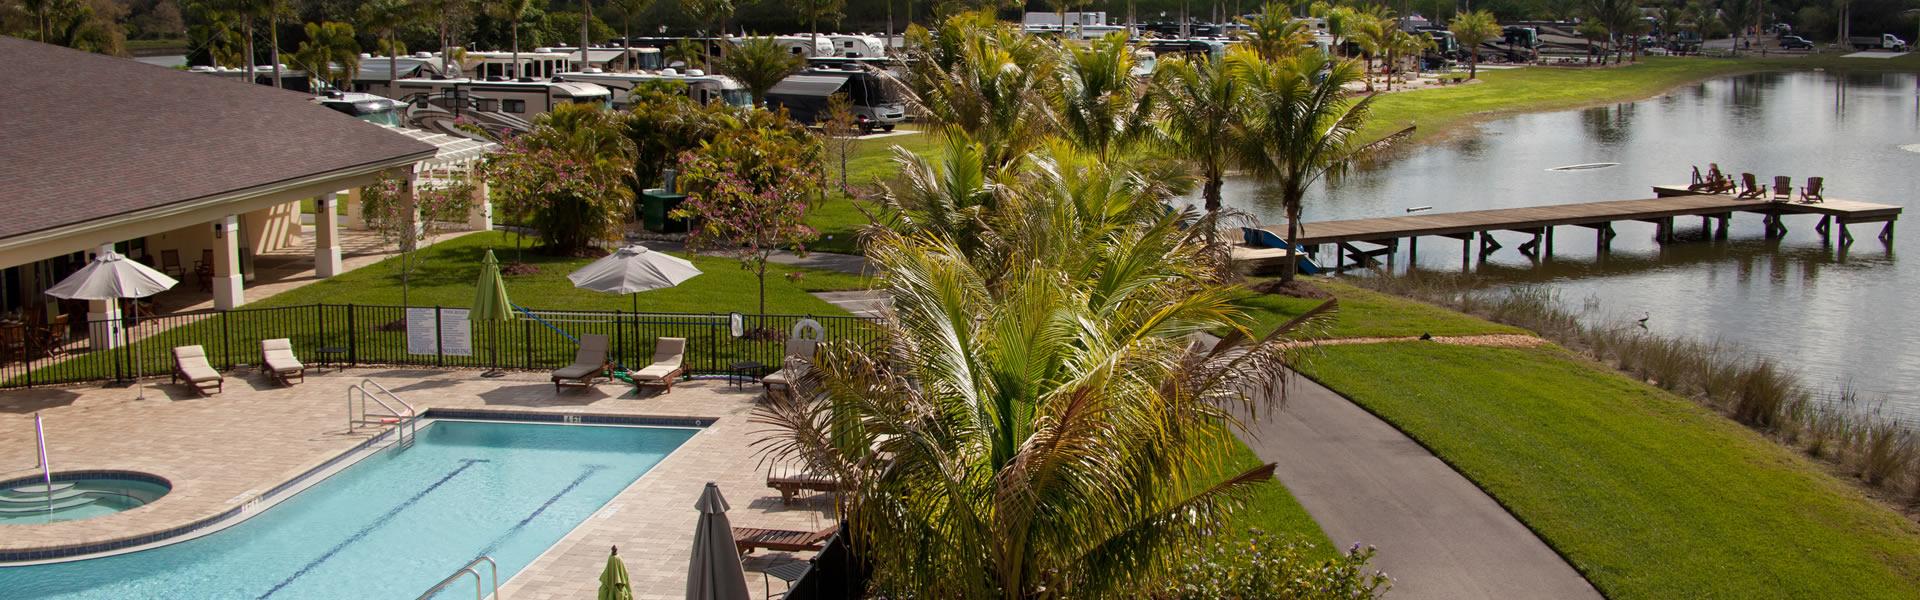 Fort Myers Fl Rv Resort Florida Rv Lots For Sale